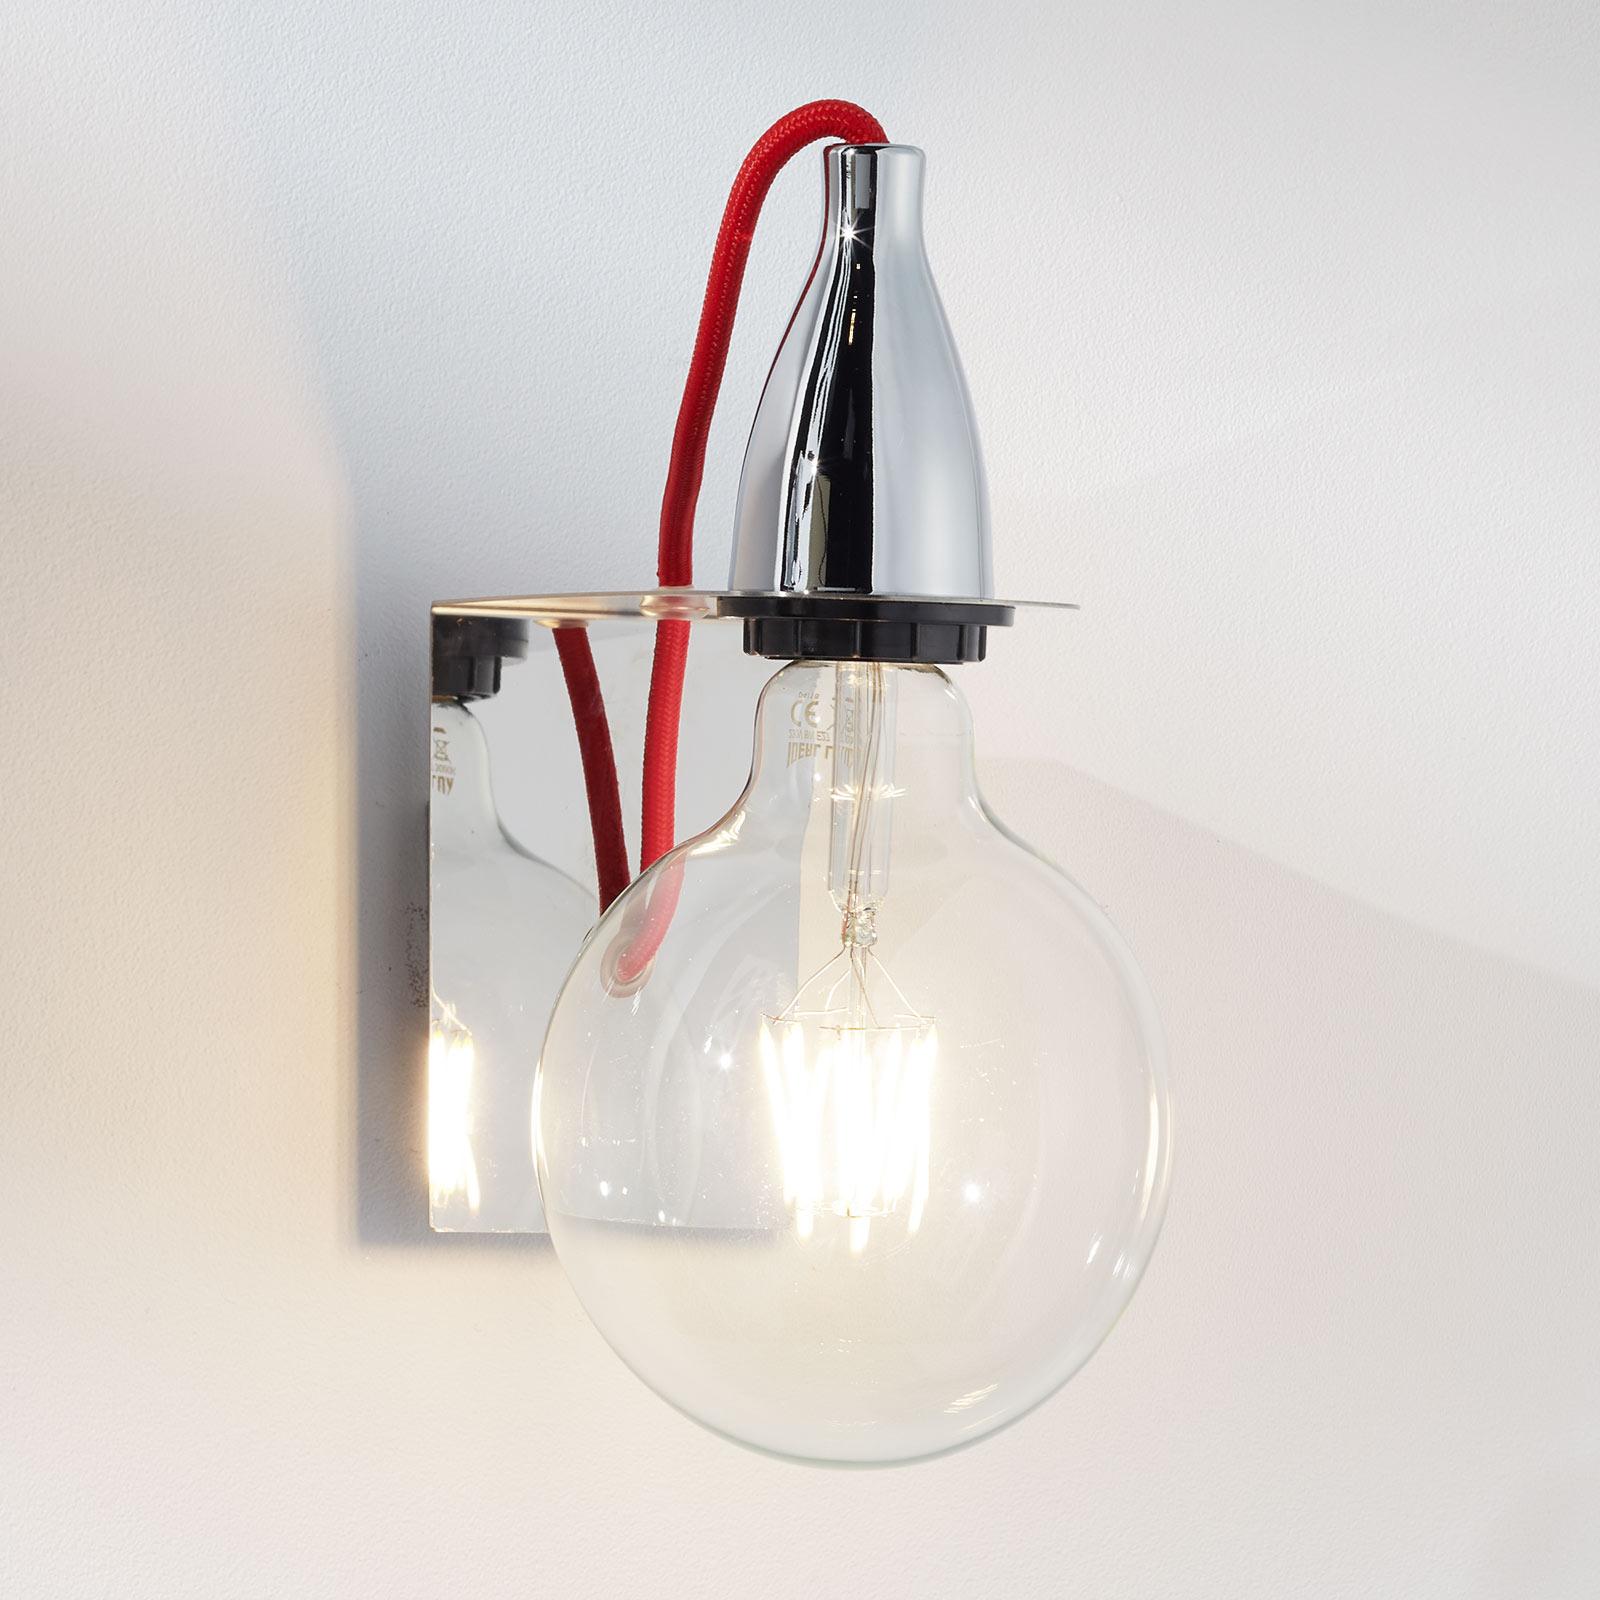 Desiggerichte wandlamp Minimal